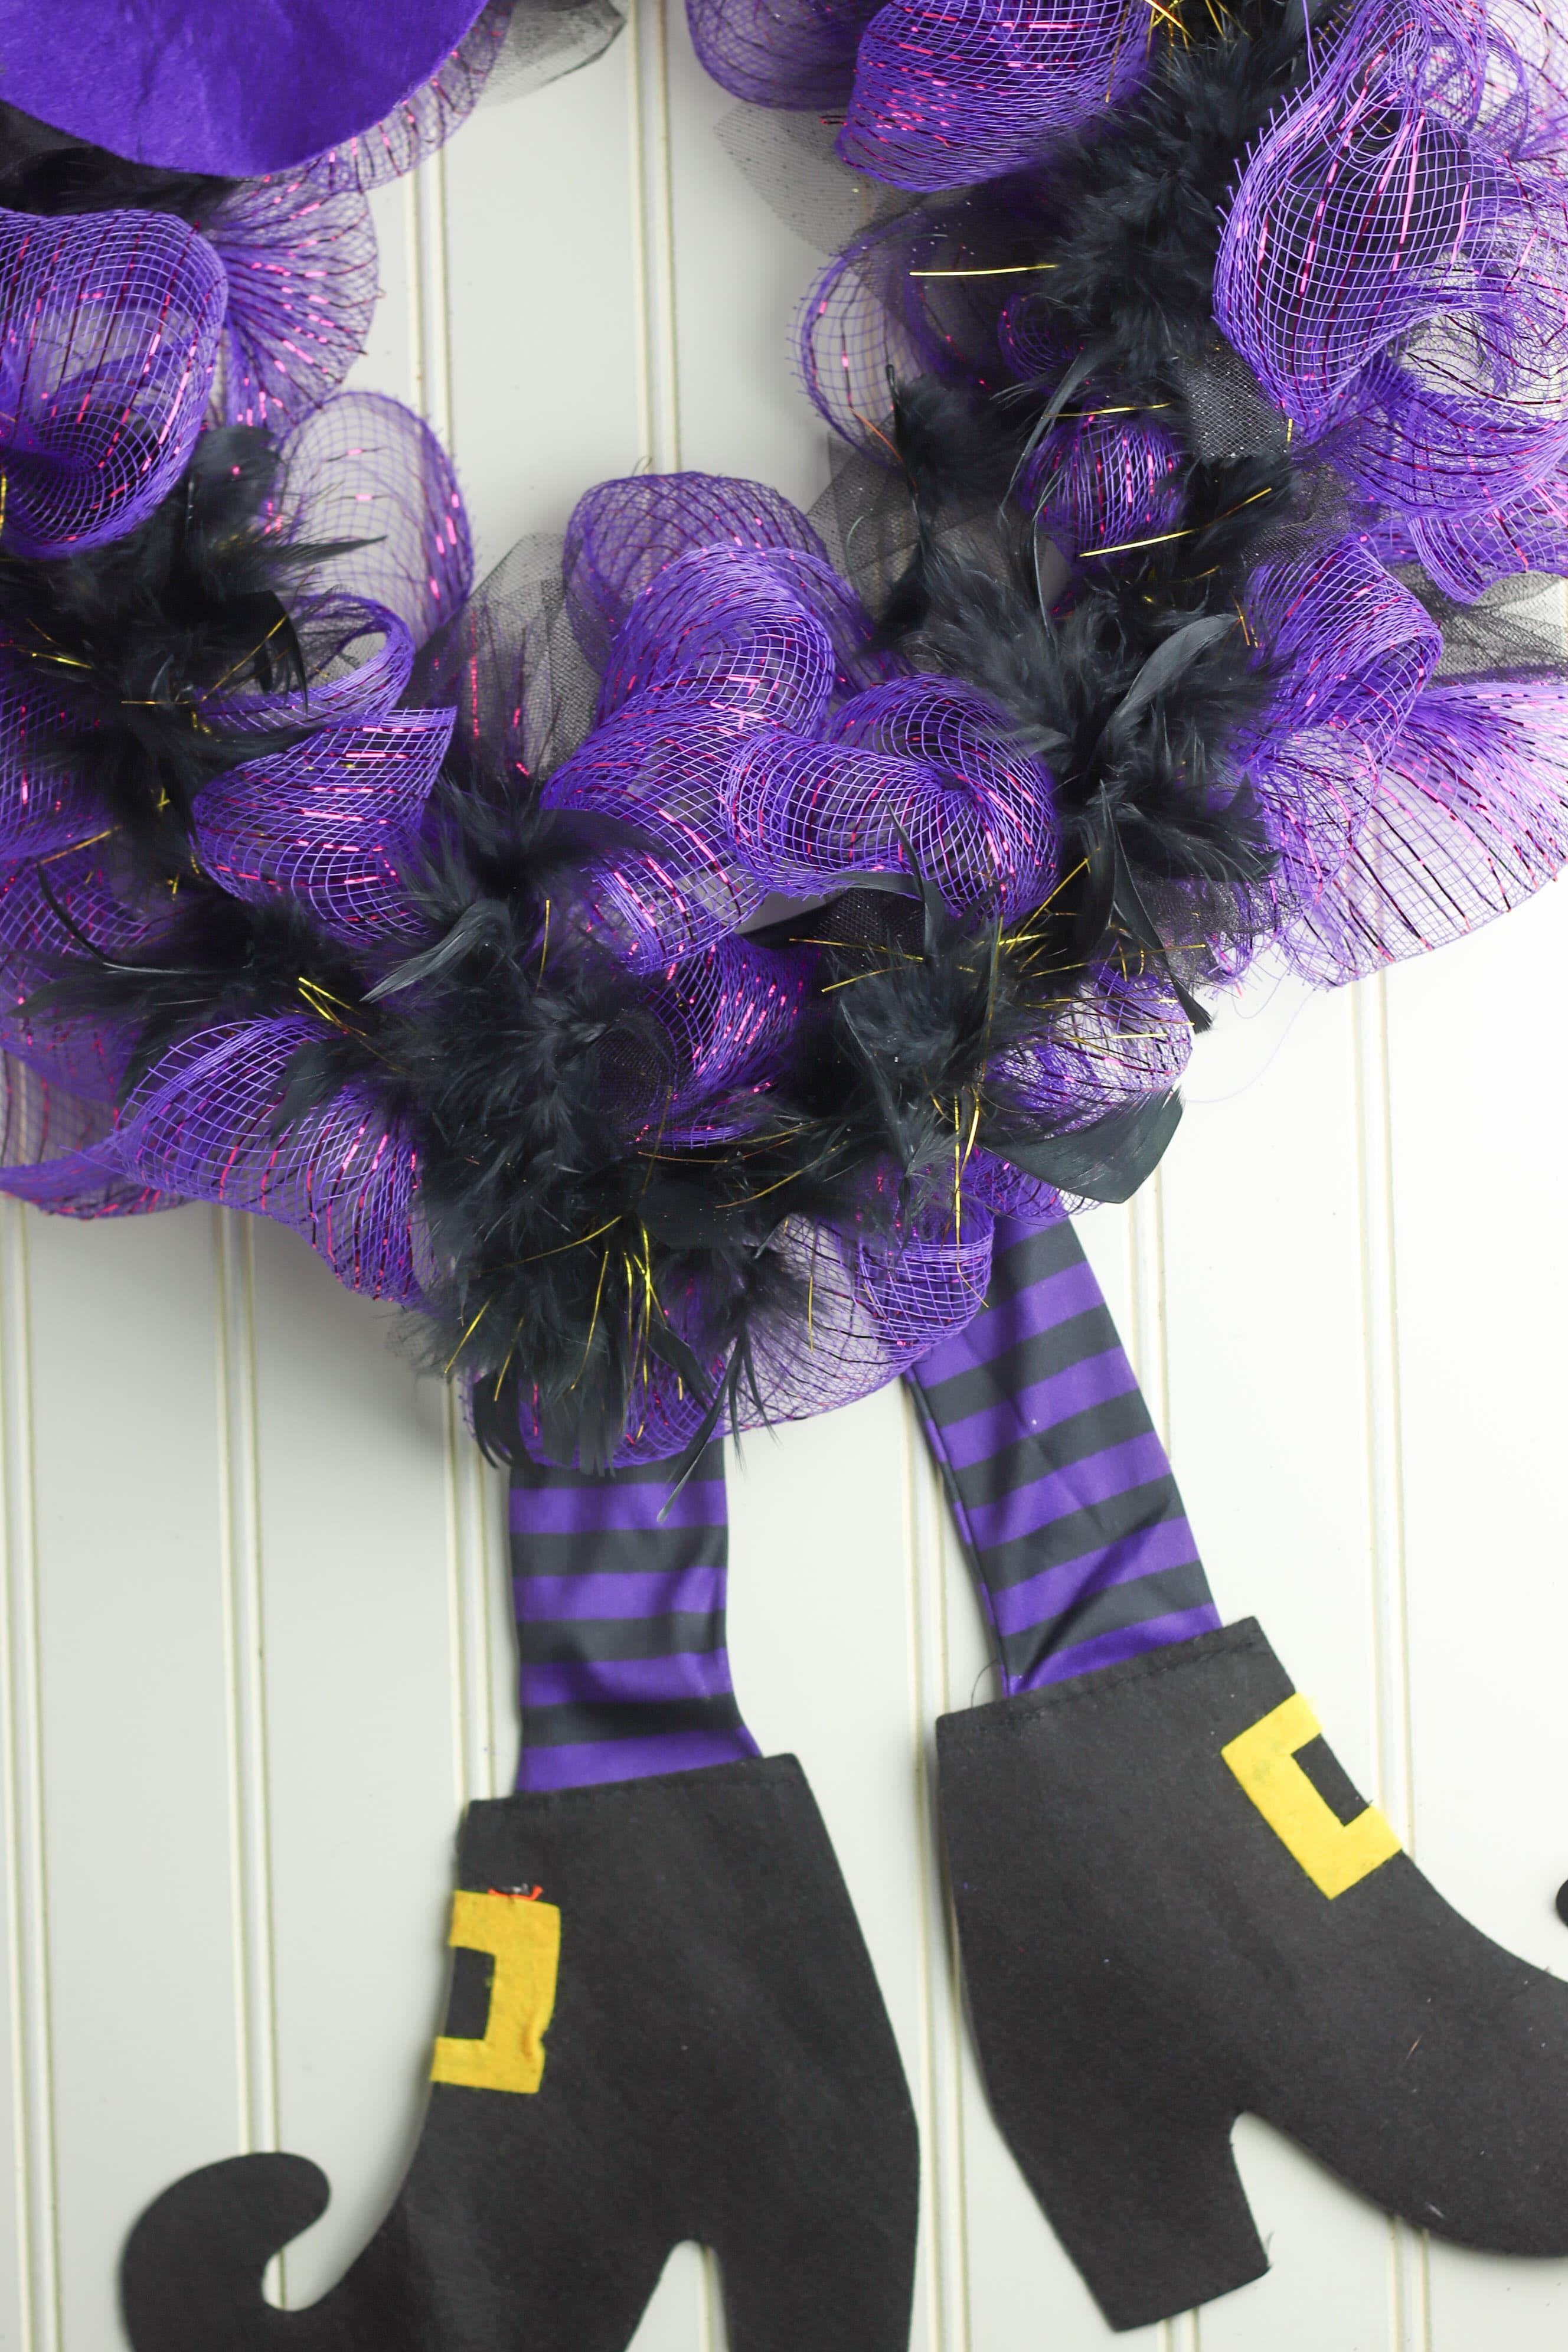 Witch legs wreath